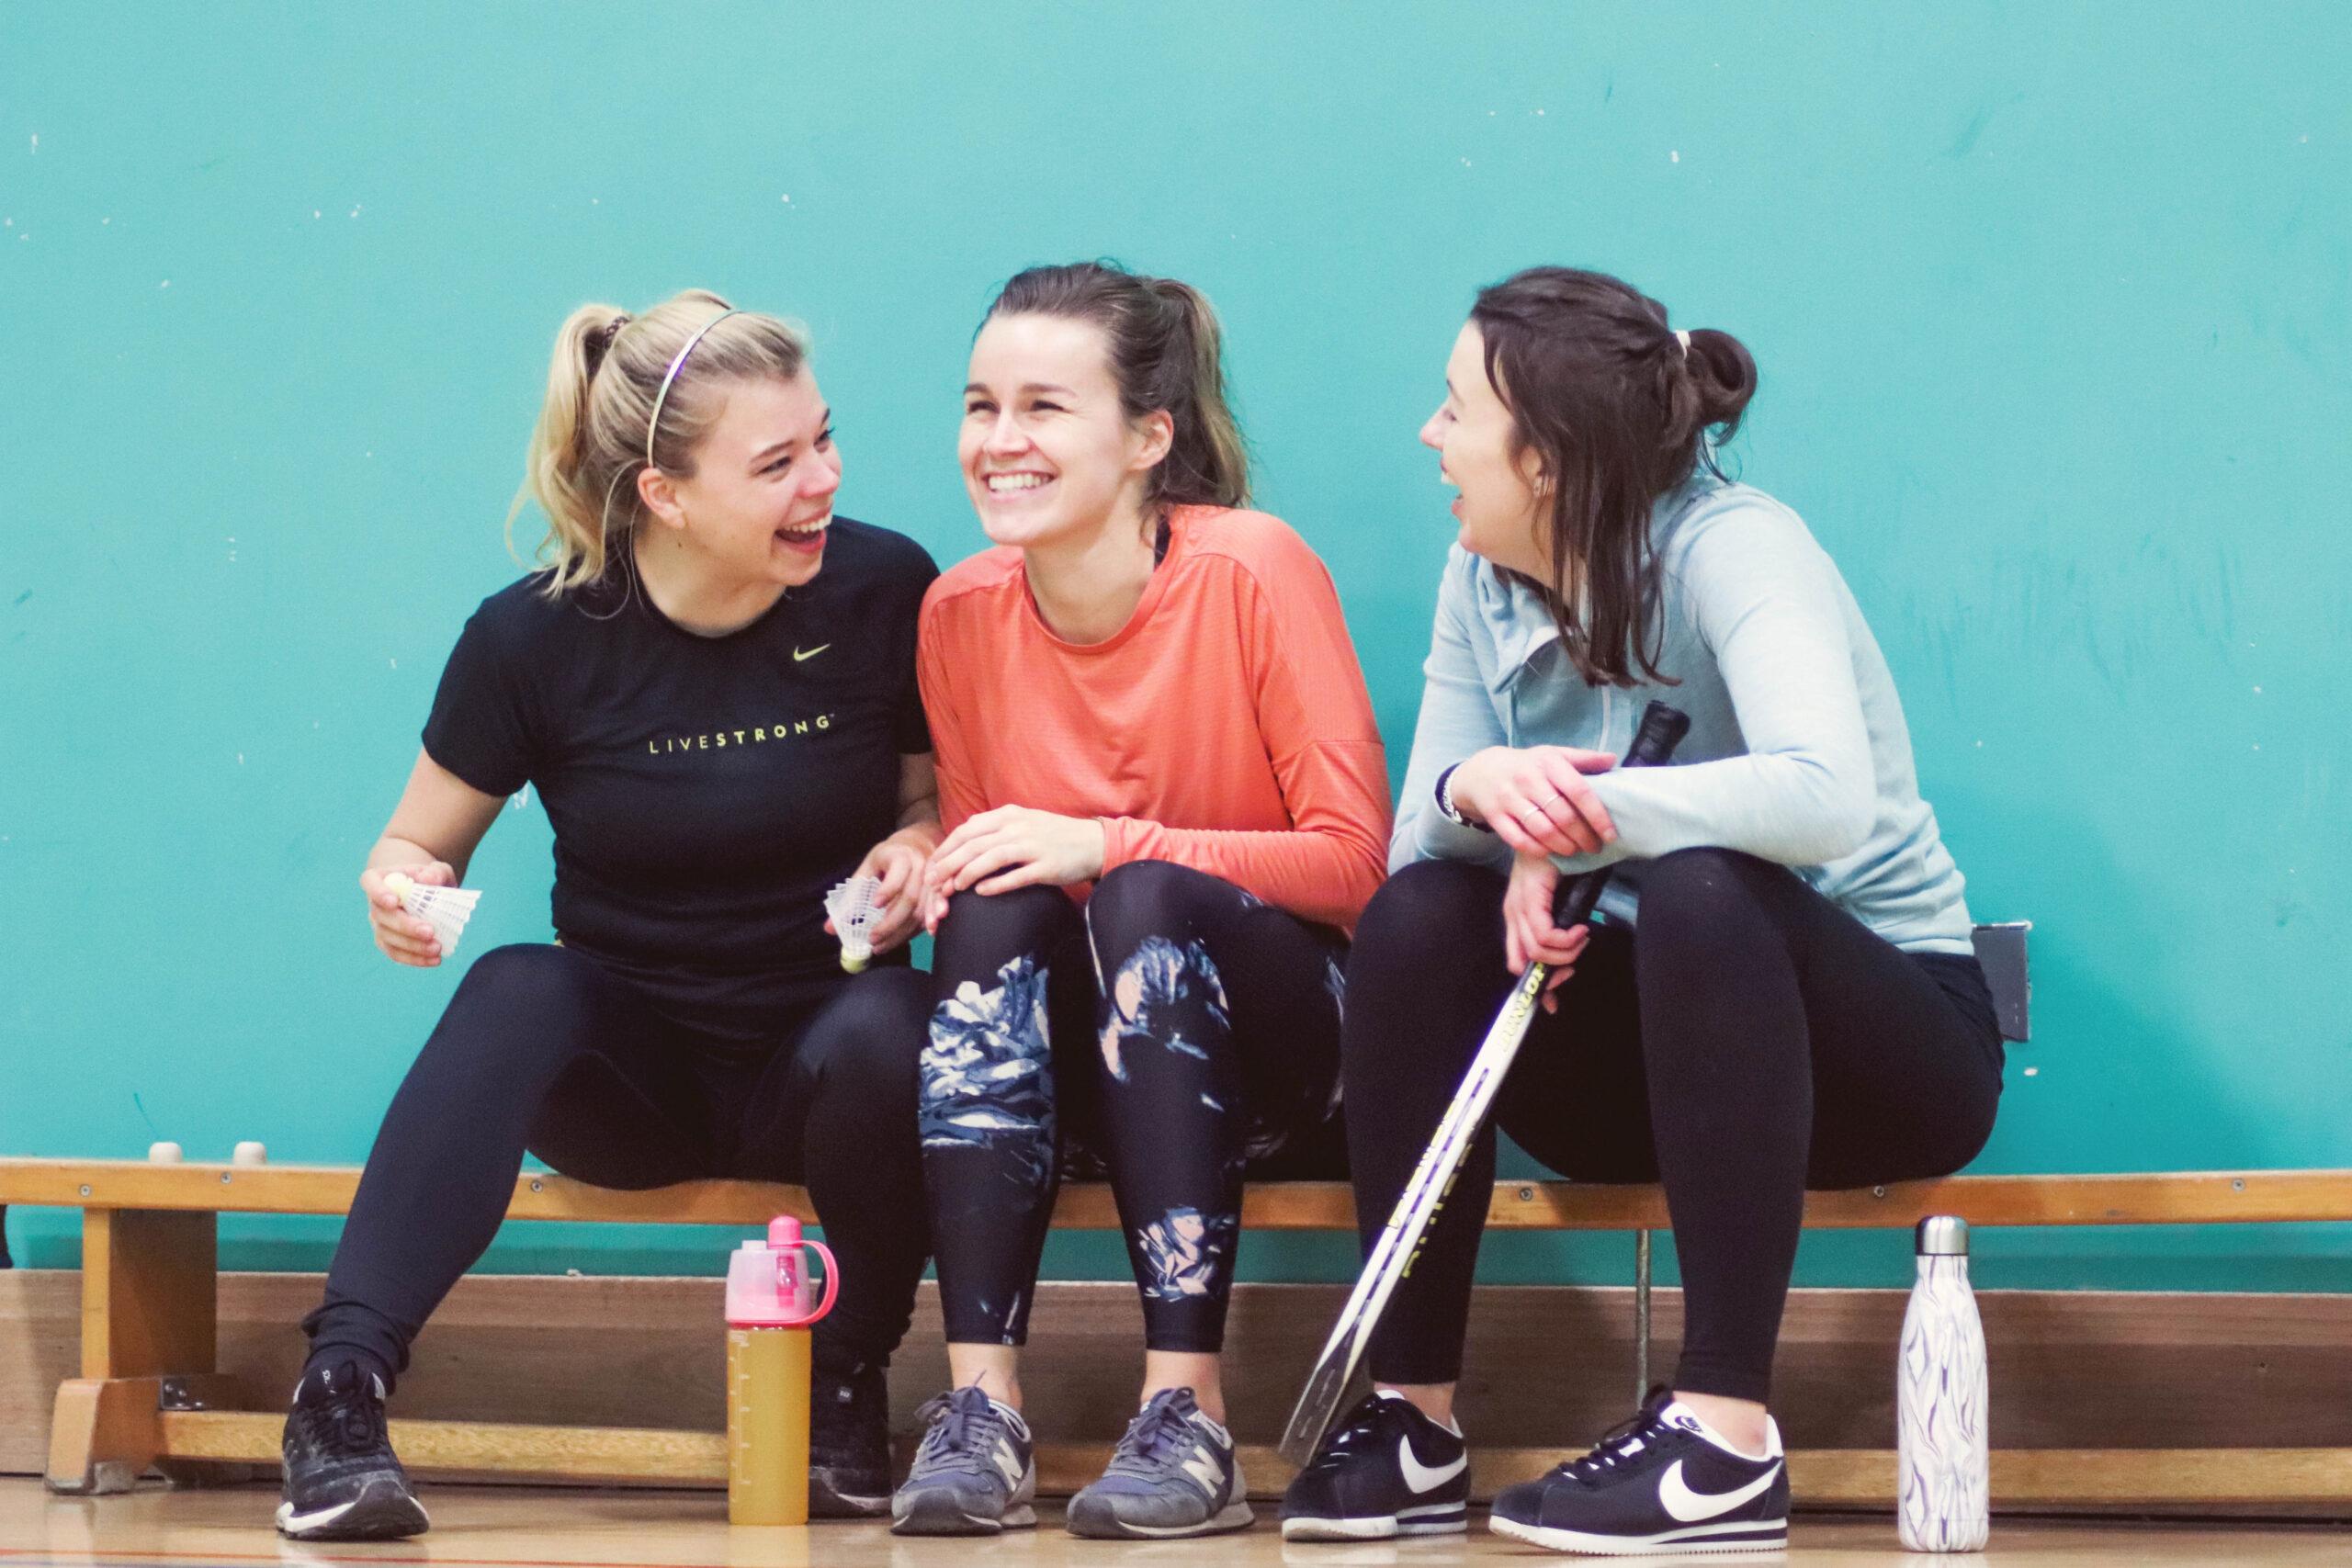 Sports Hall Girls 3